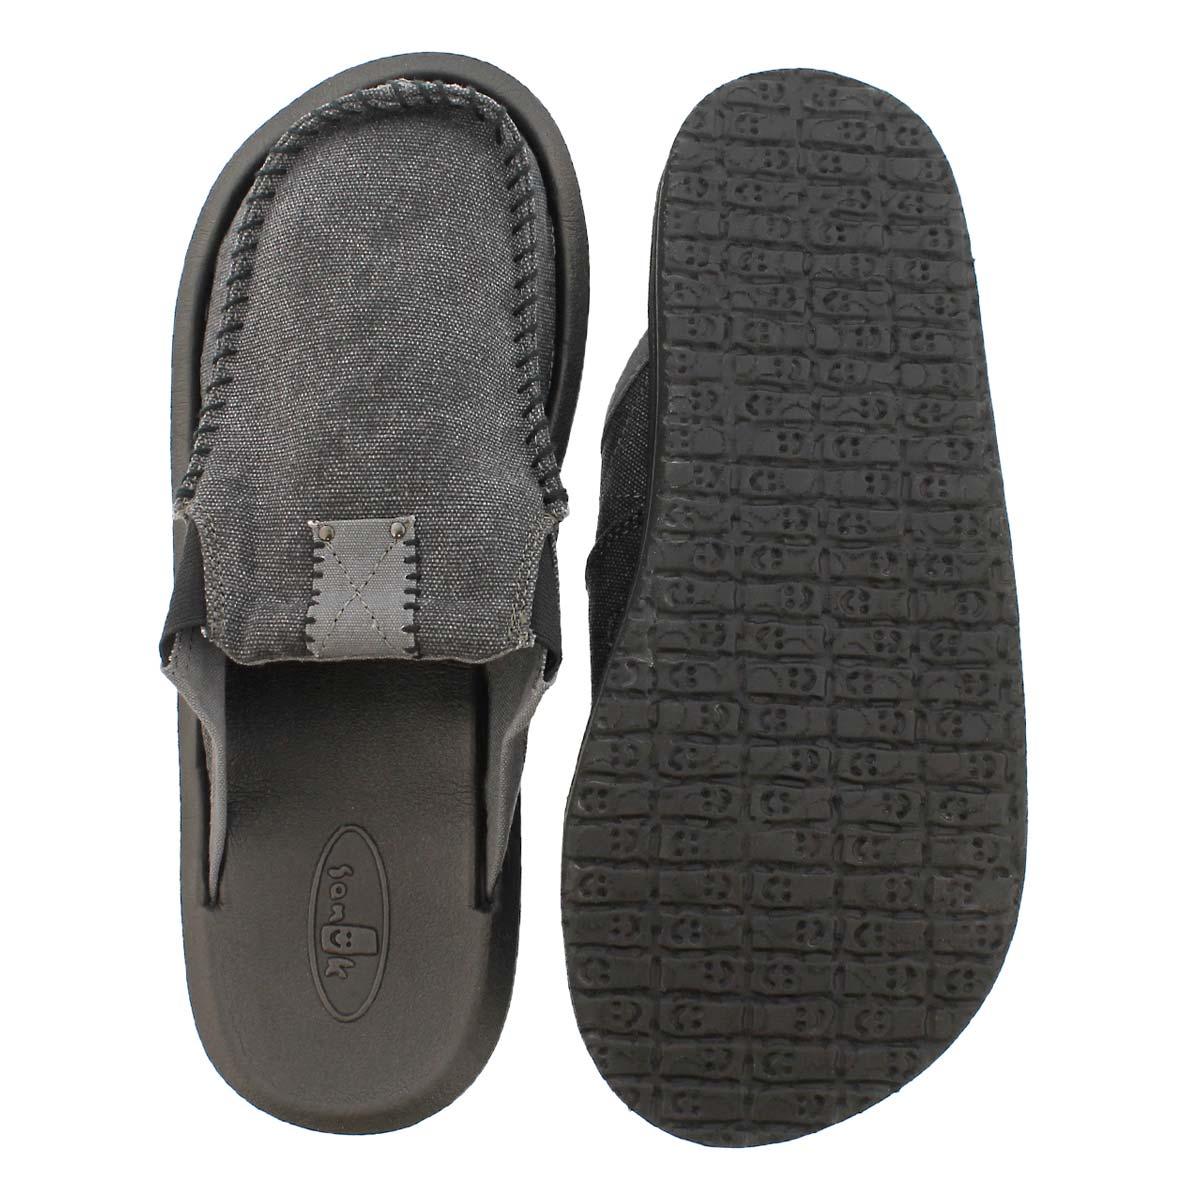 Mns YouGotMyBackII cha open back shoe